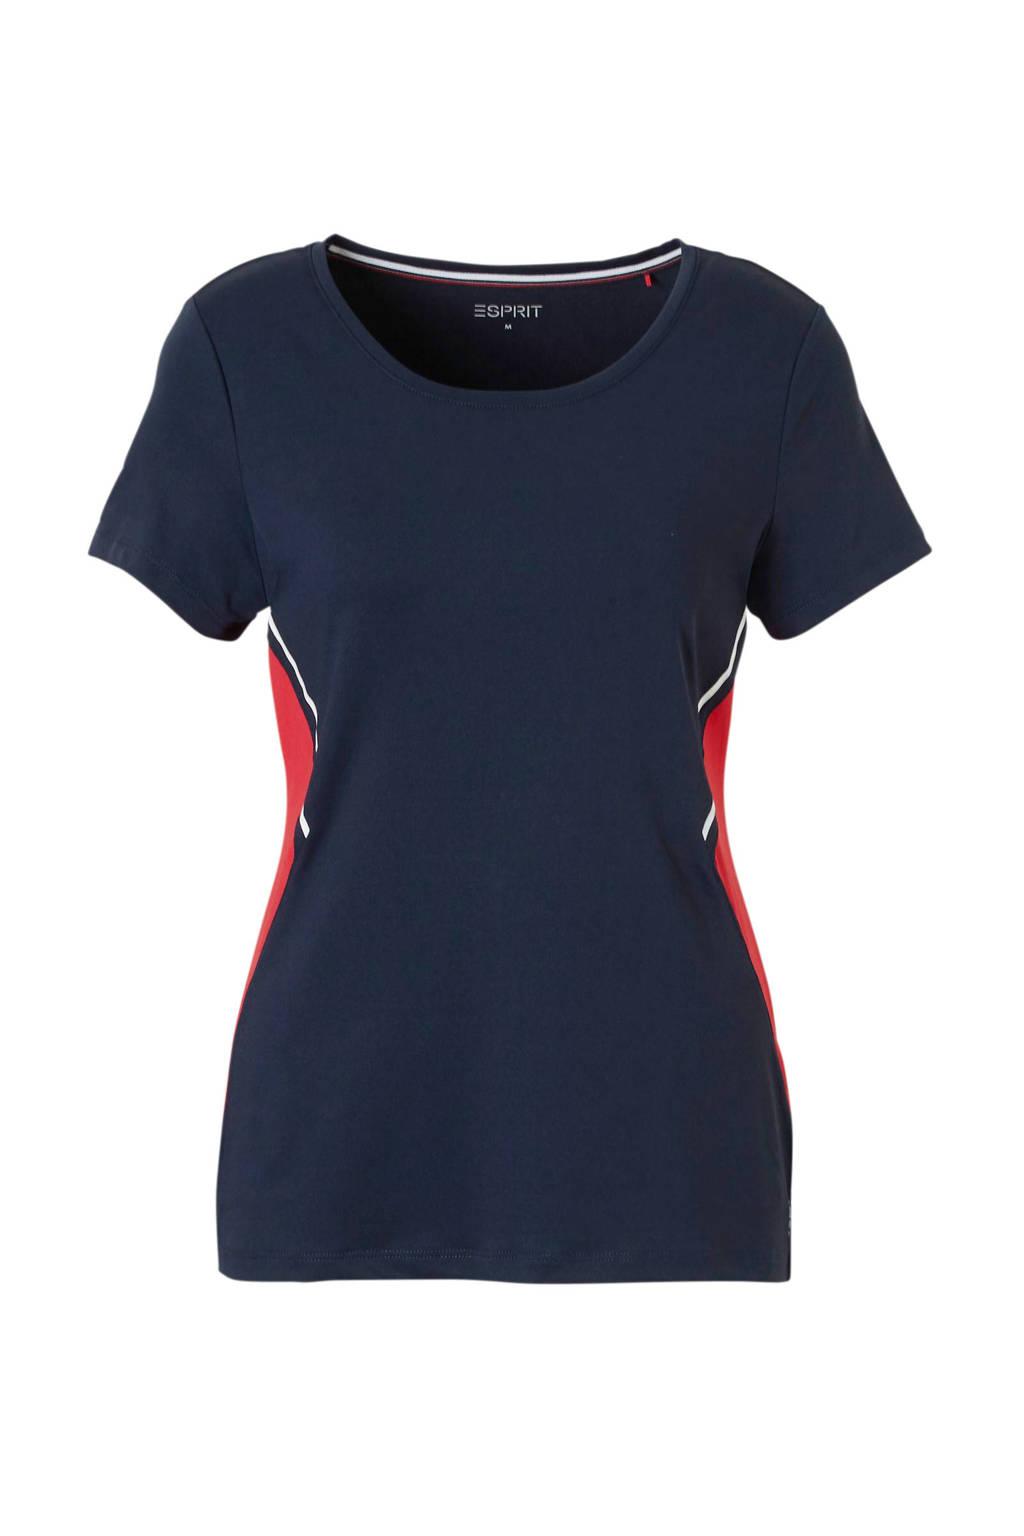 ESPRIT Women Sports T-shirt blauw, Blauw/rood